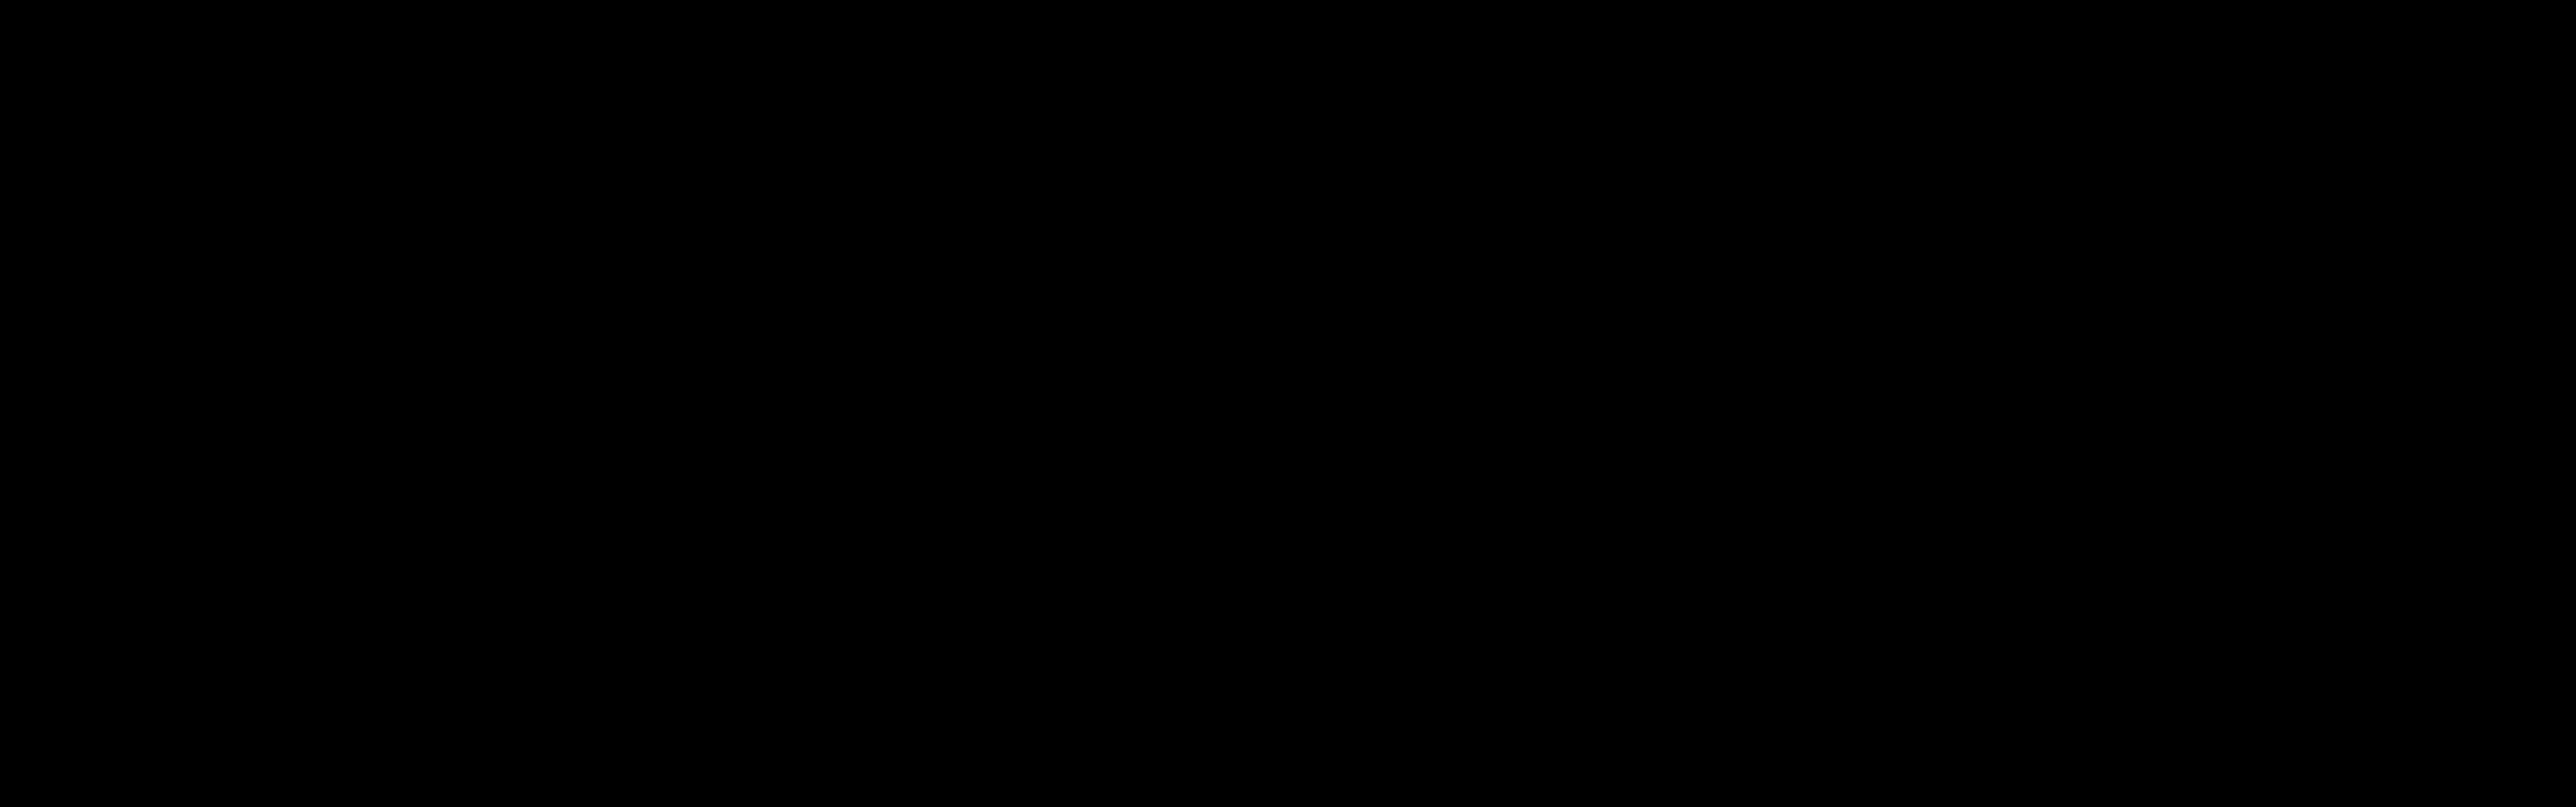 allenatibene5